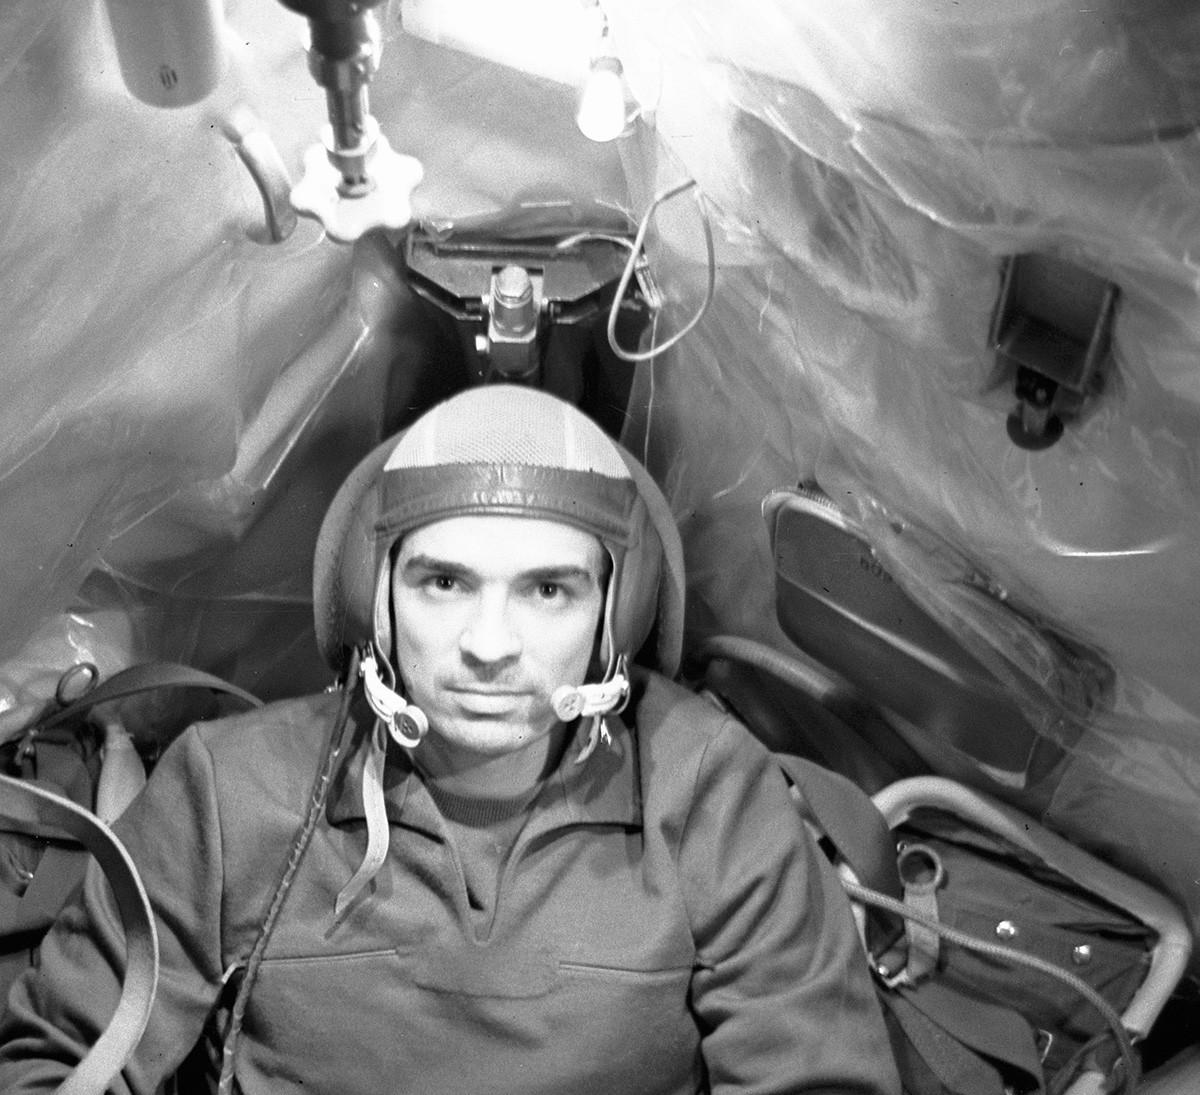 Commander of the Soyuz-23 spacecraft Vyacheslav Zudov during training in the simulator ship